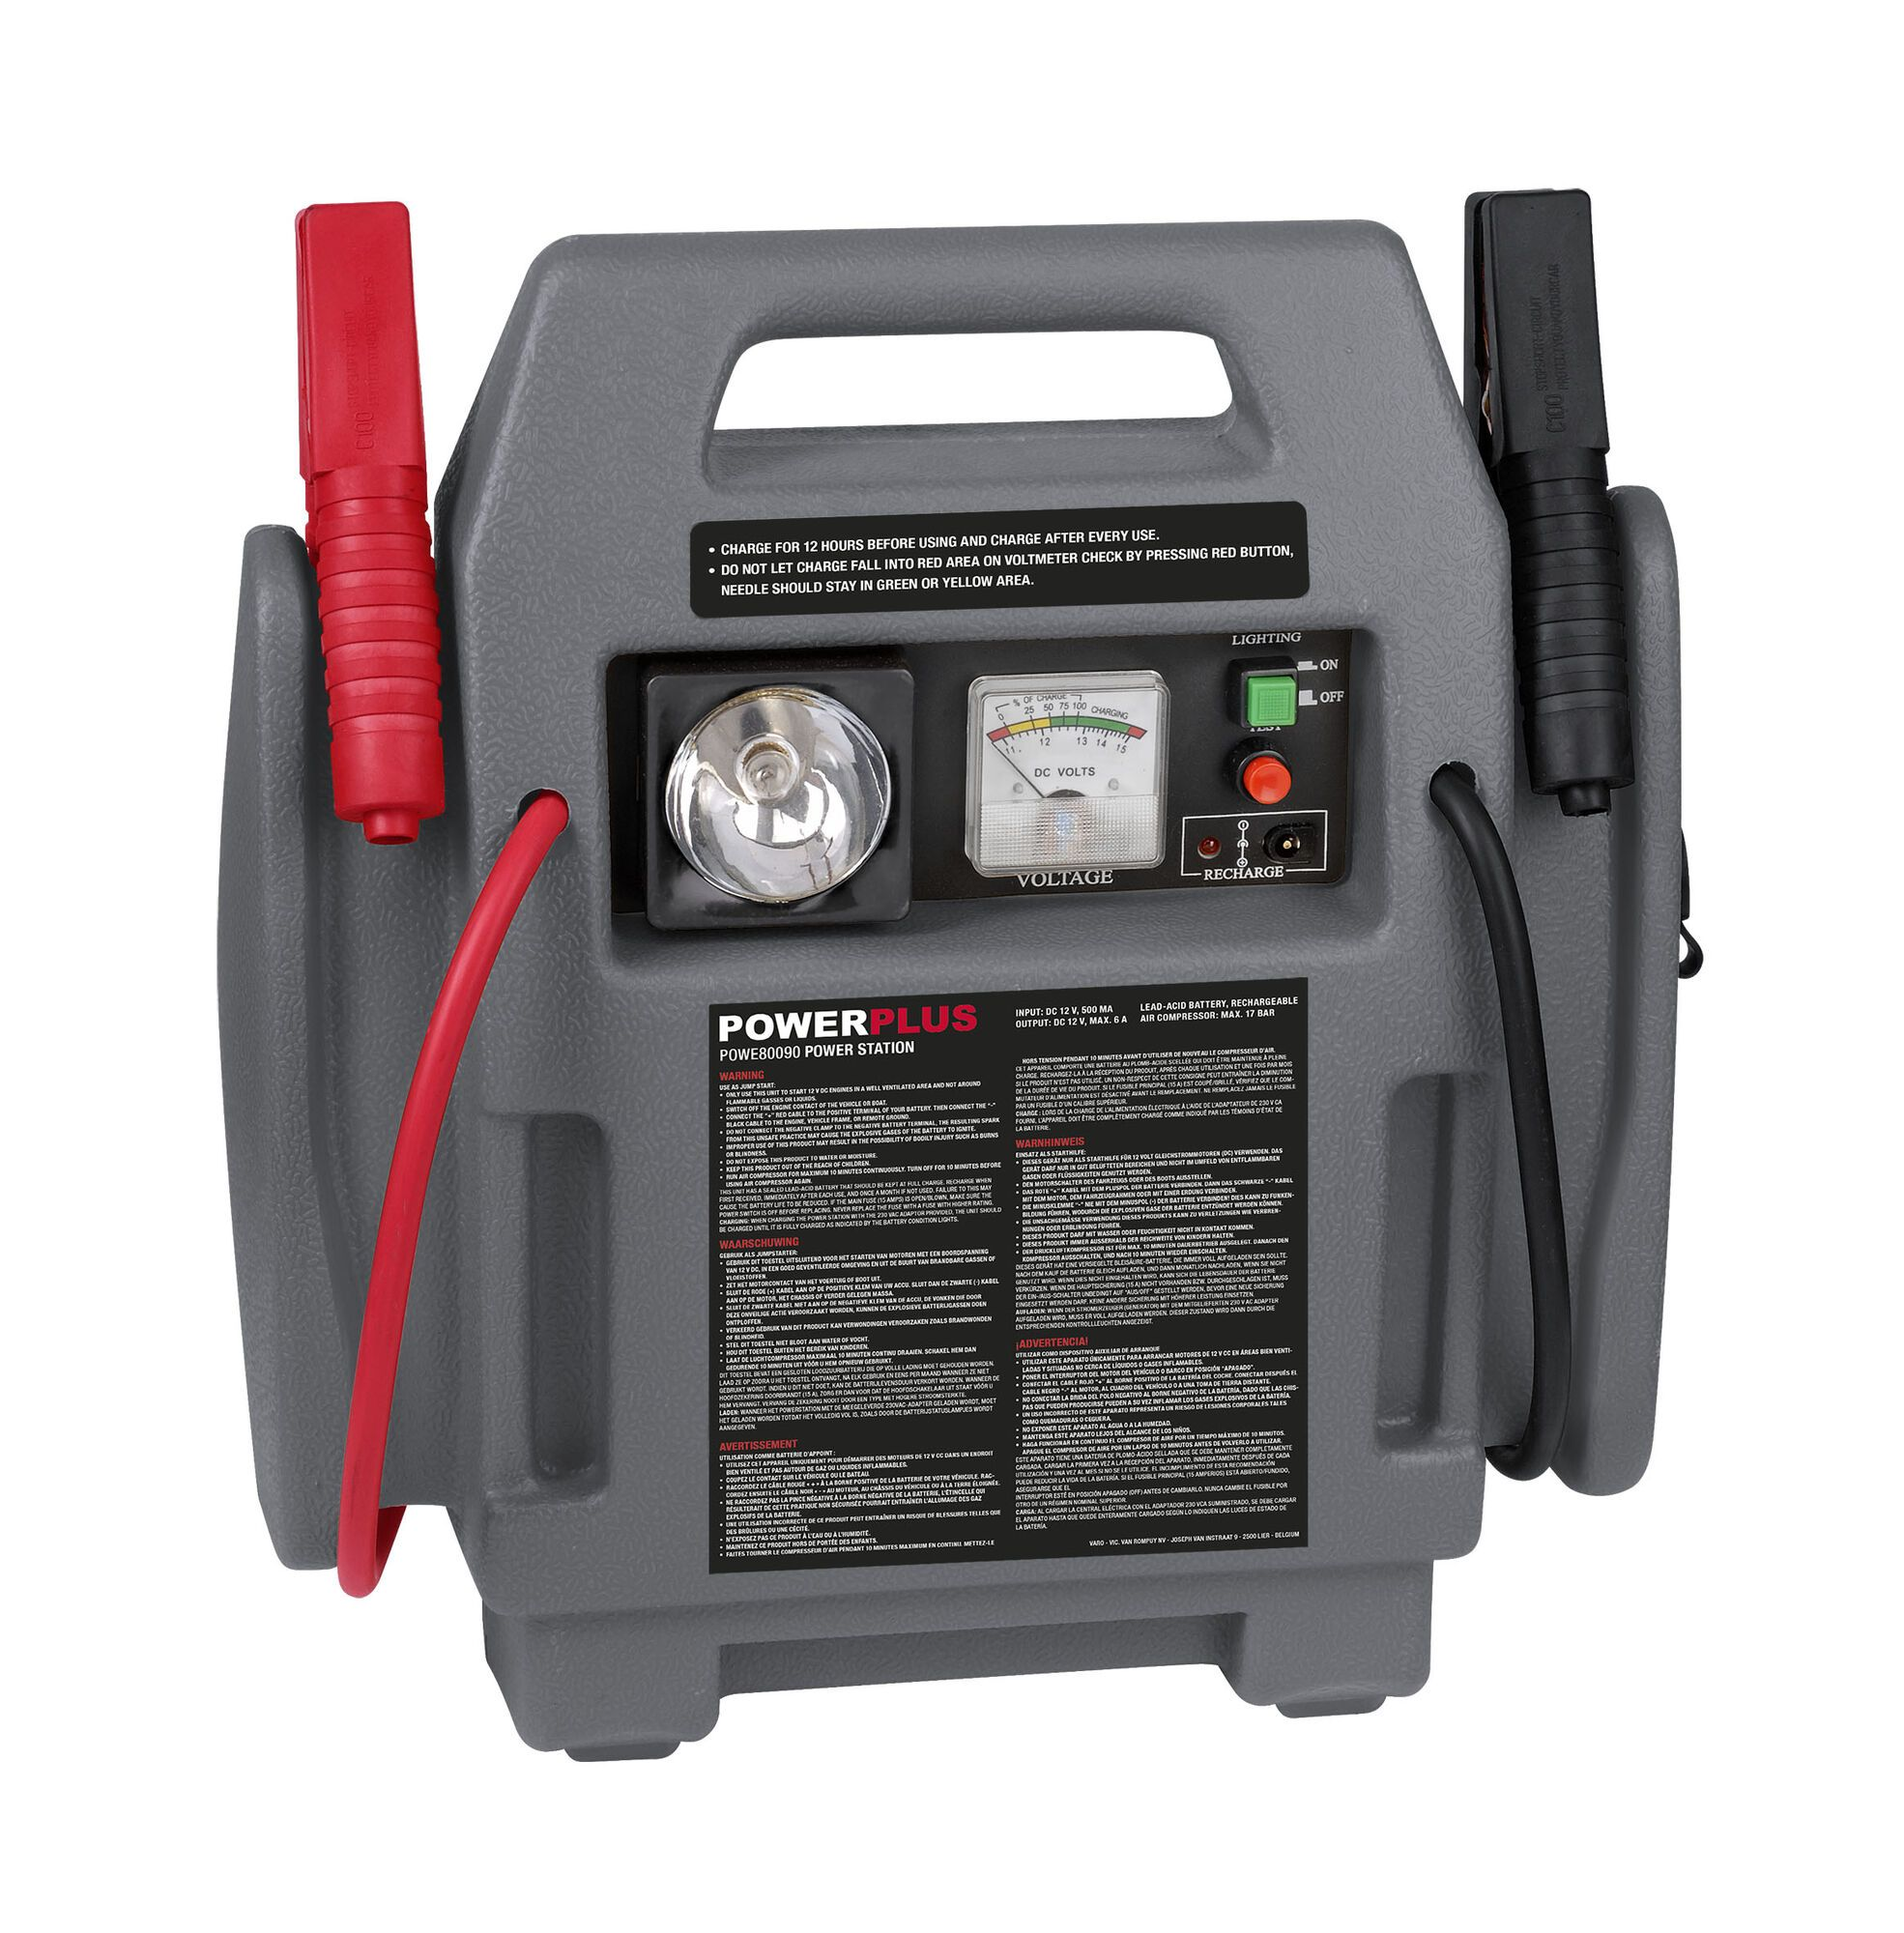 Powerplus POWE80090 Energiestation | Compressor | Jumpstarter | Starthulp 4-in-1